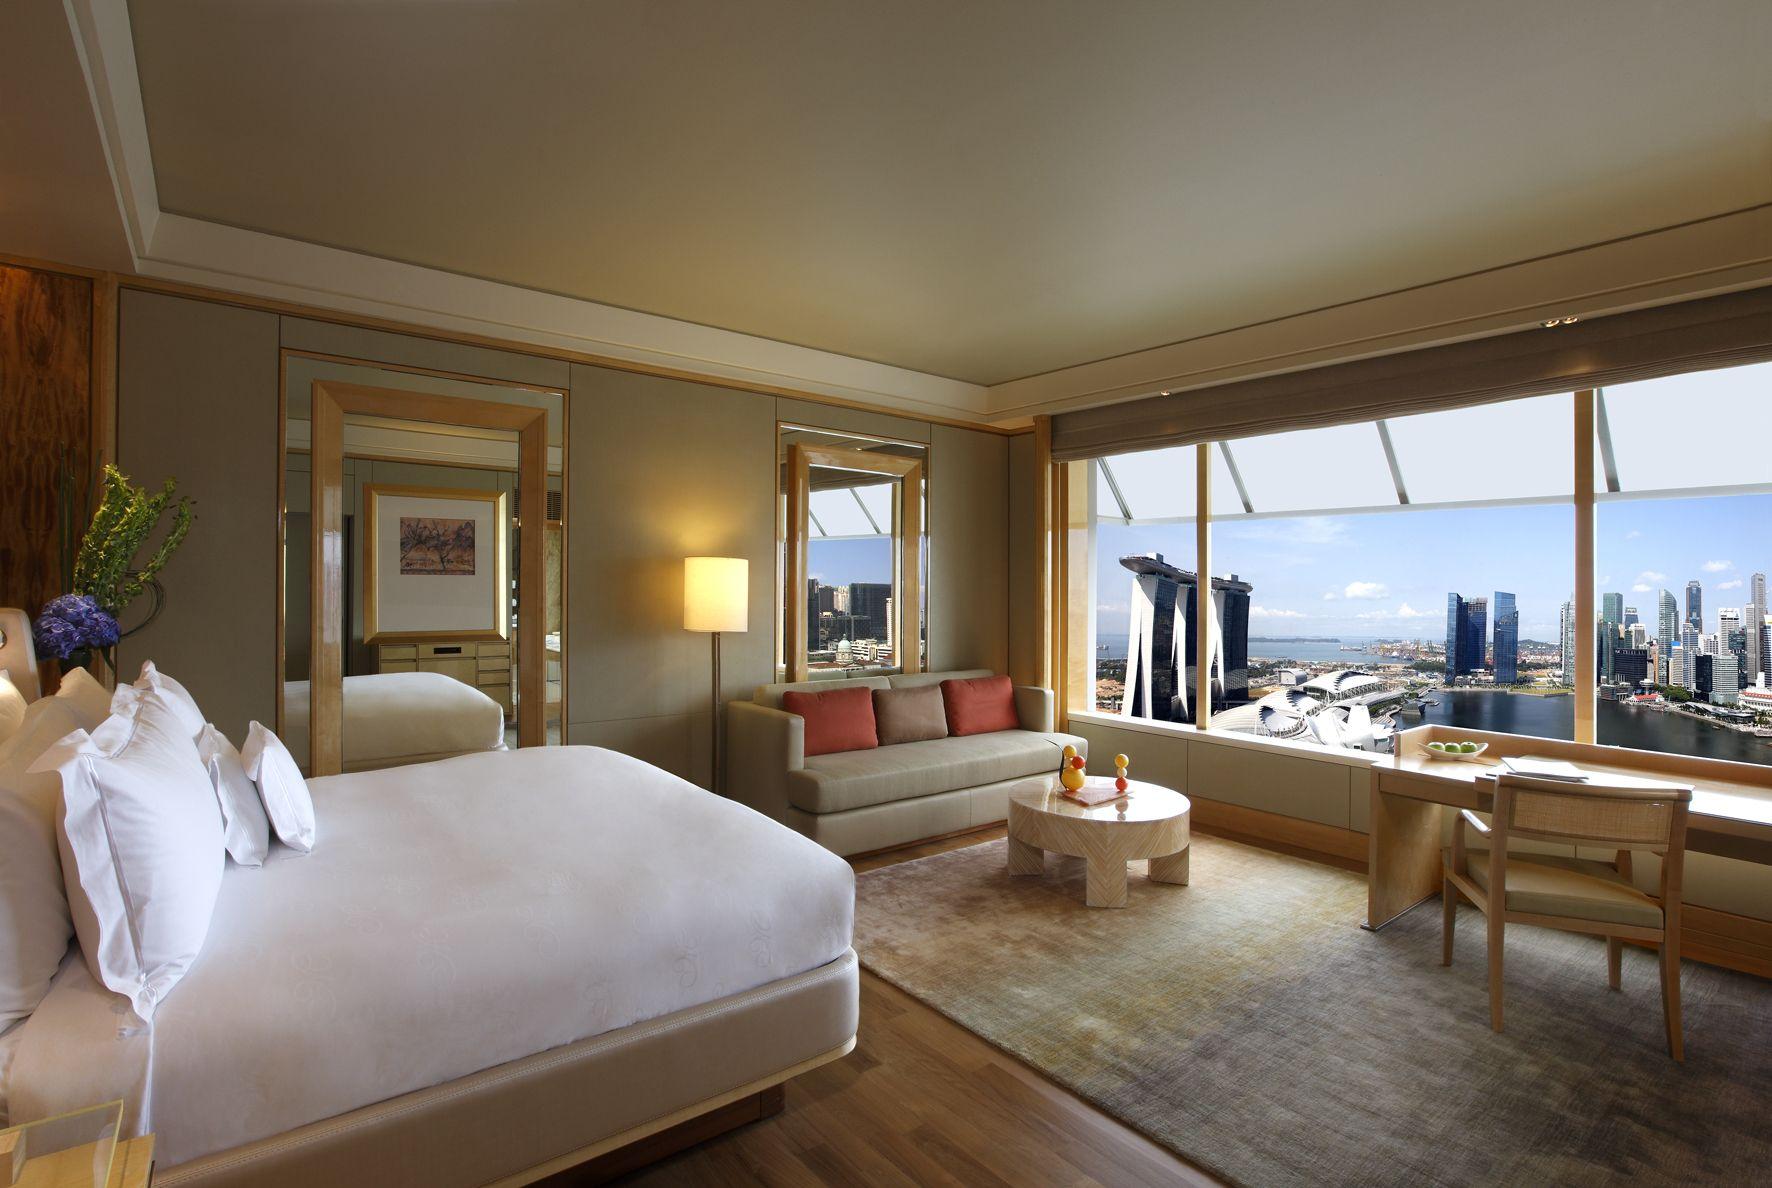 Marina Bay Sands Singapore Connoisseur S Hotel Bedroom Decor